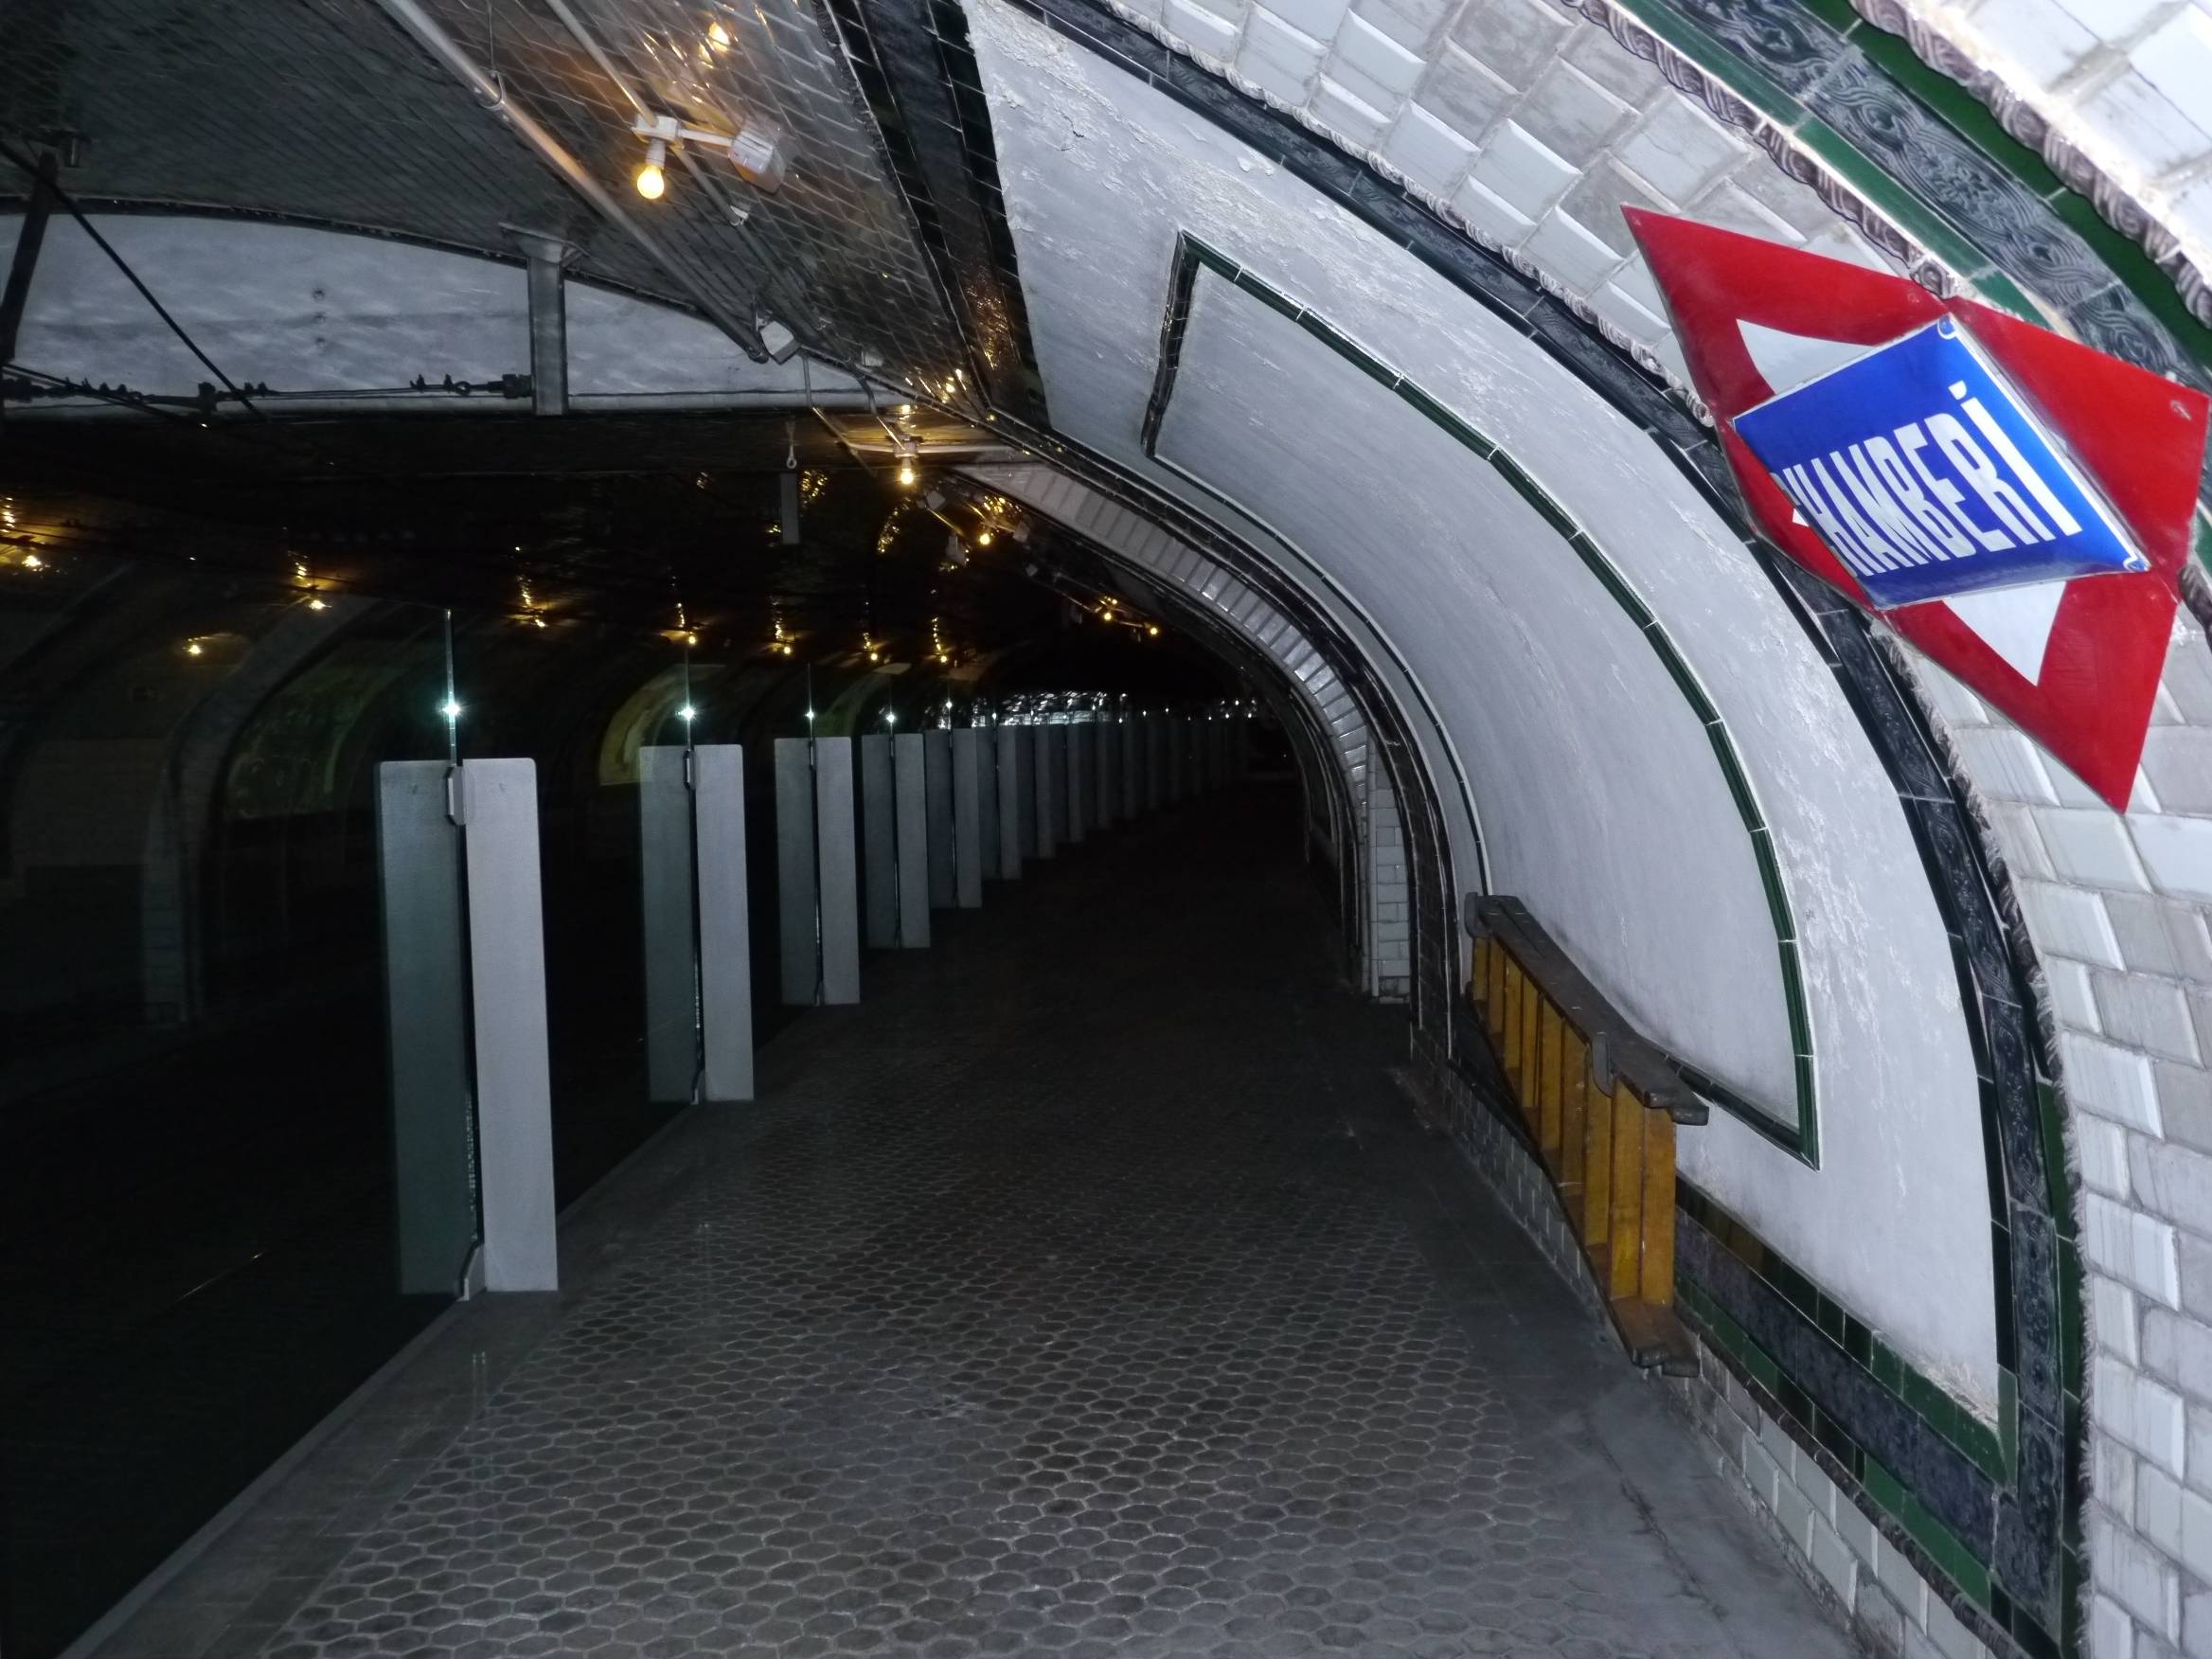 10 lugares desconocidos de Madrid - Estación abandonada de Chamberí